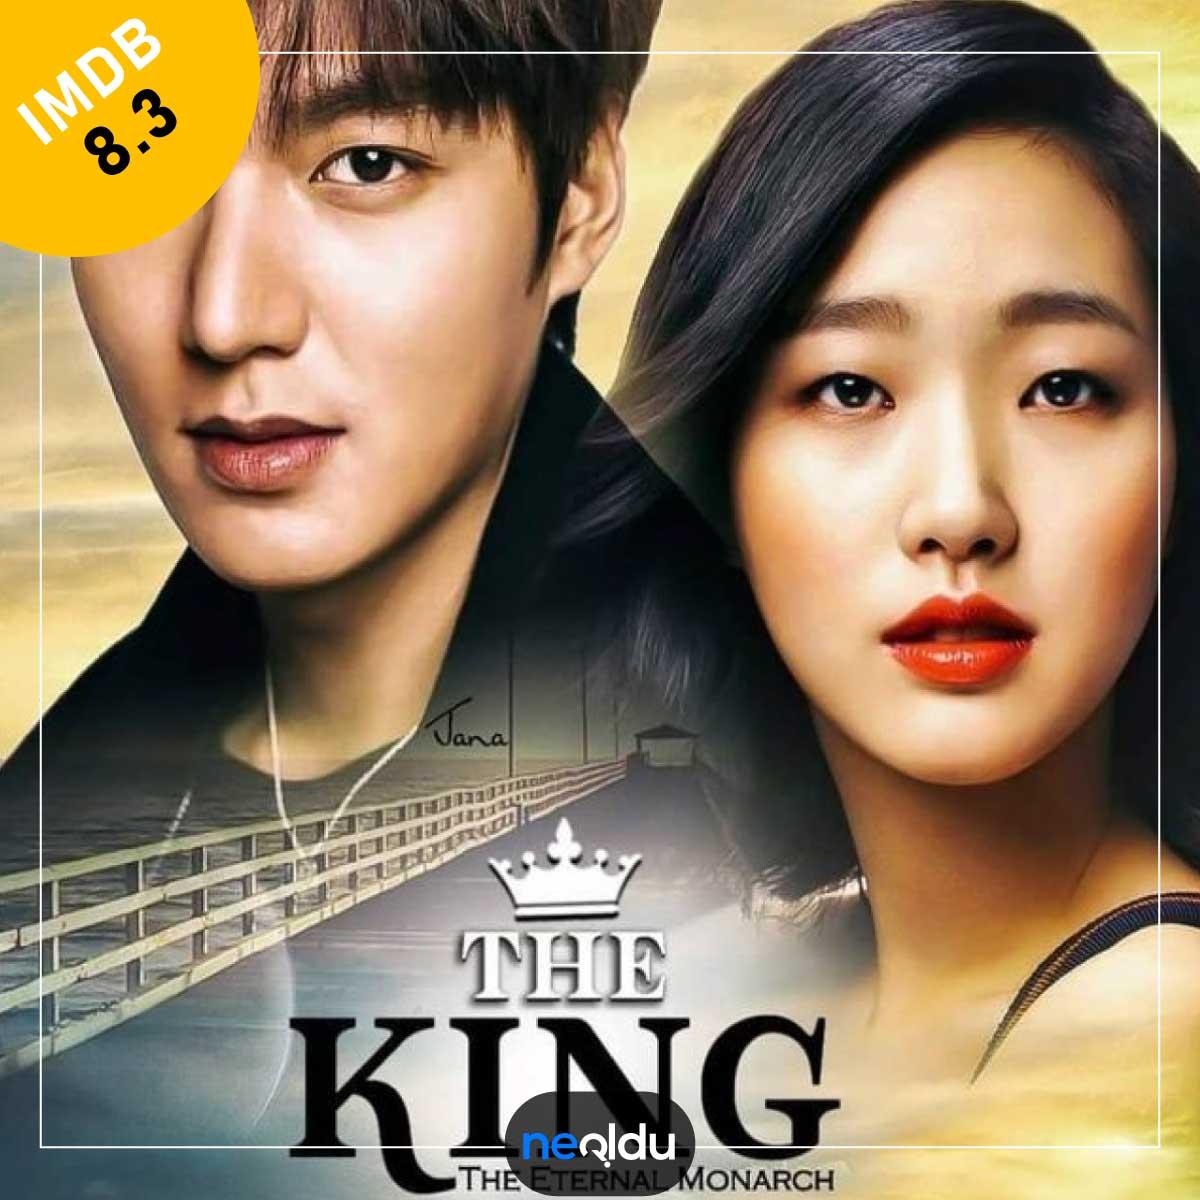 En İyi Netflix Kore Dizileri, Netflix Kore Dizisi Önerileri